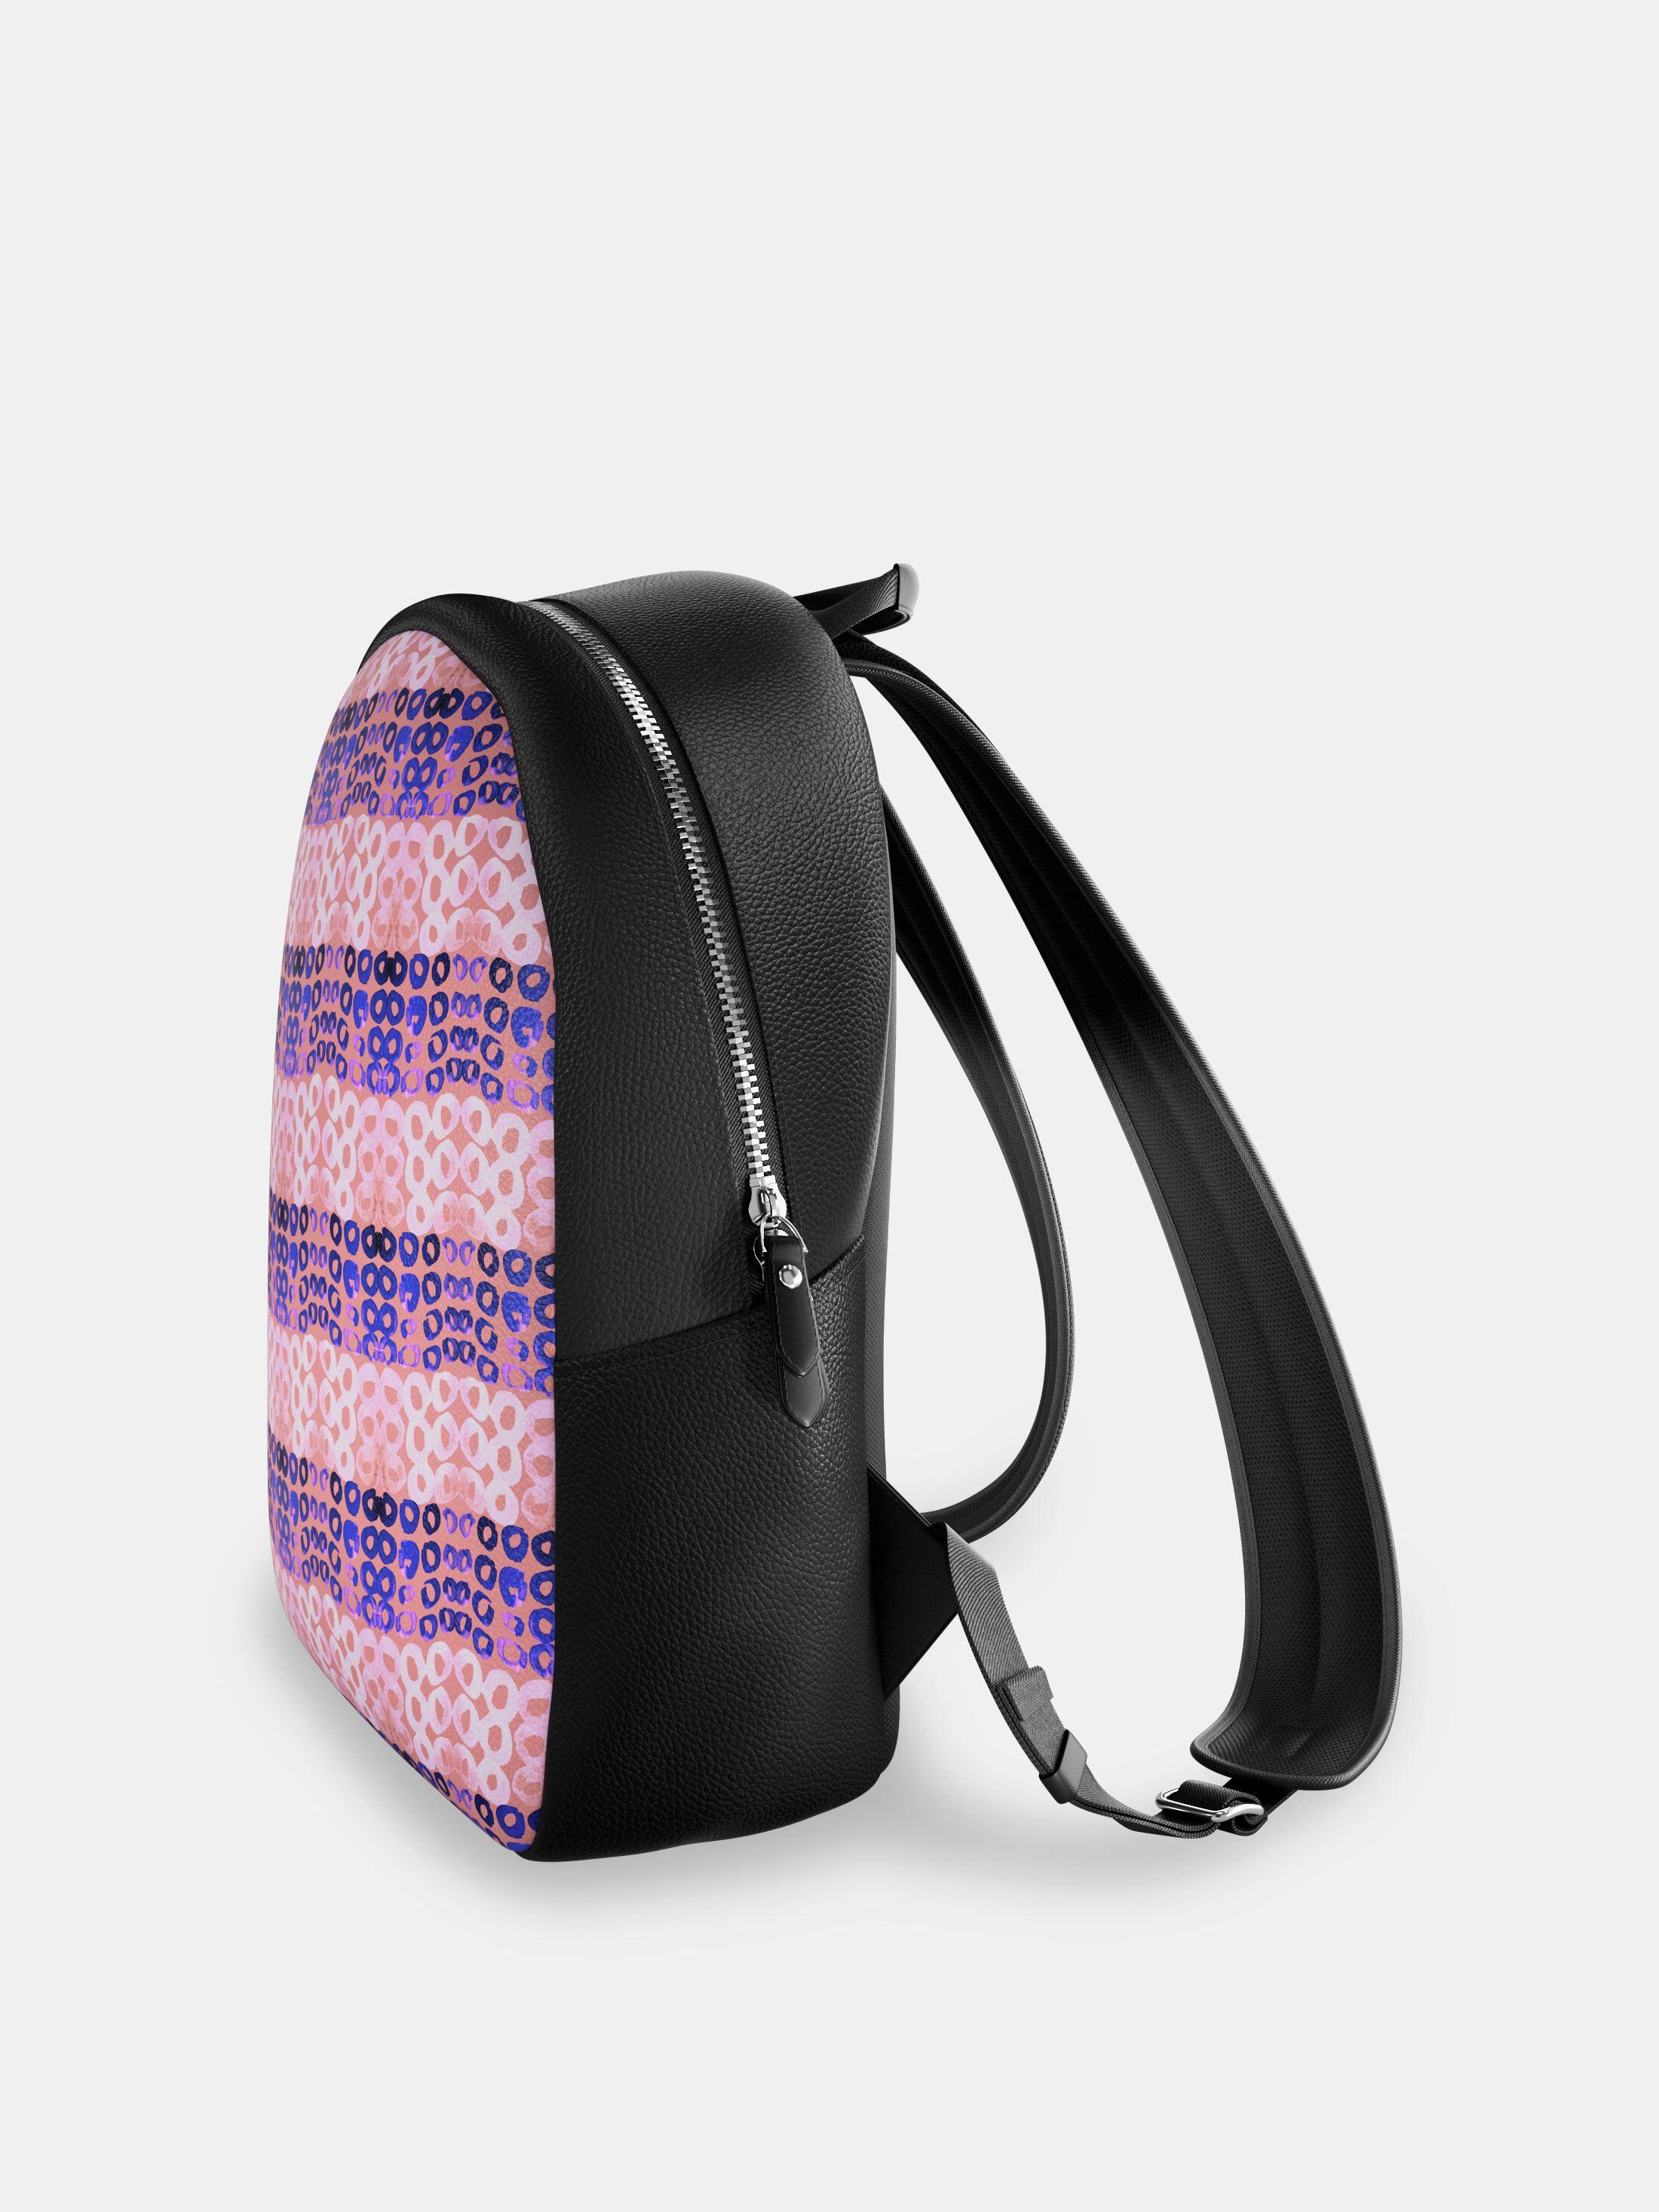 design your own rucksack